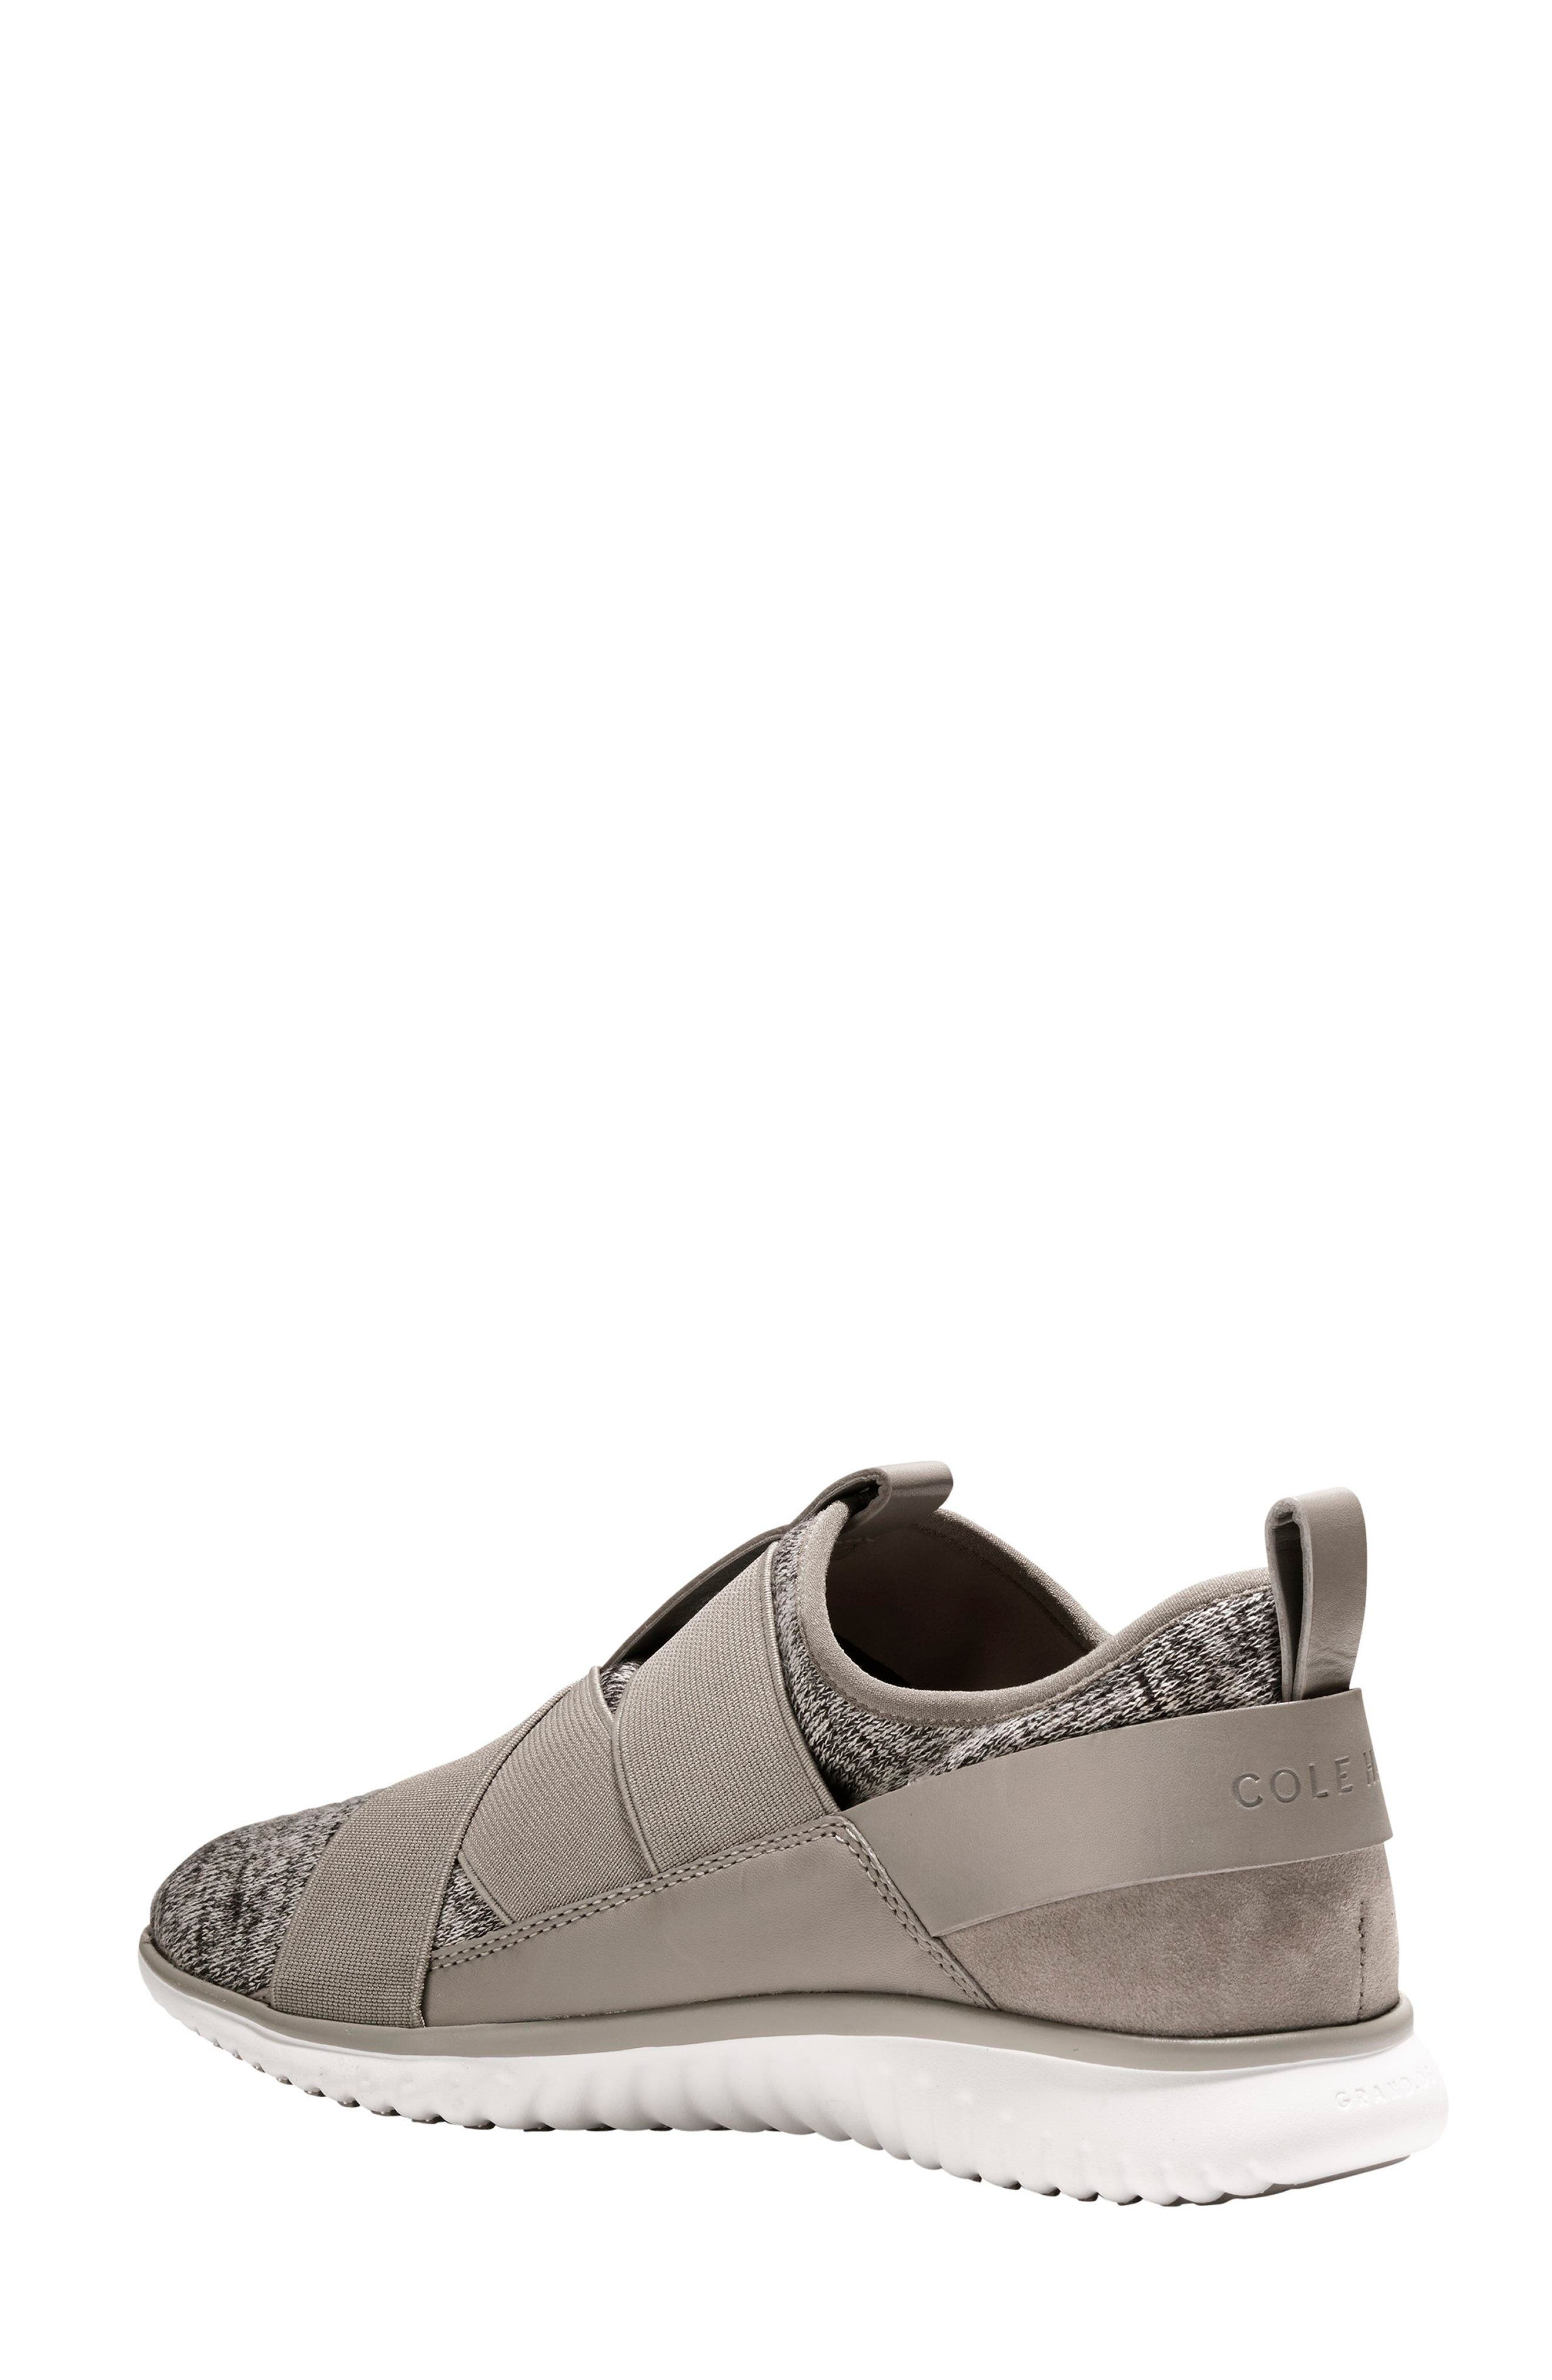 'StudioGrand' Sneaker,                             Alternate thumbnail 2, color,                             Rockridge/ Pumice Stone Fabric